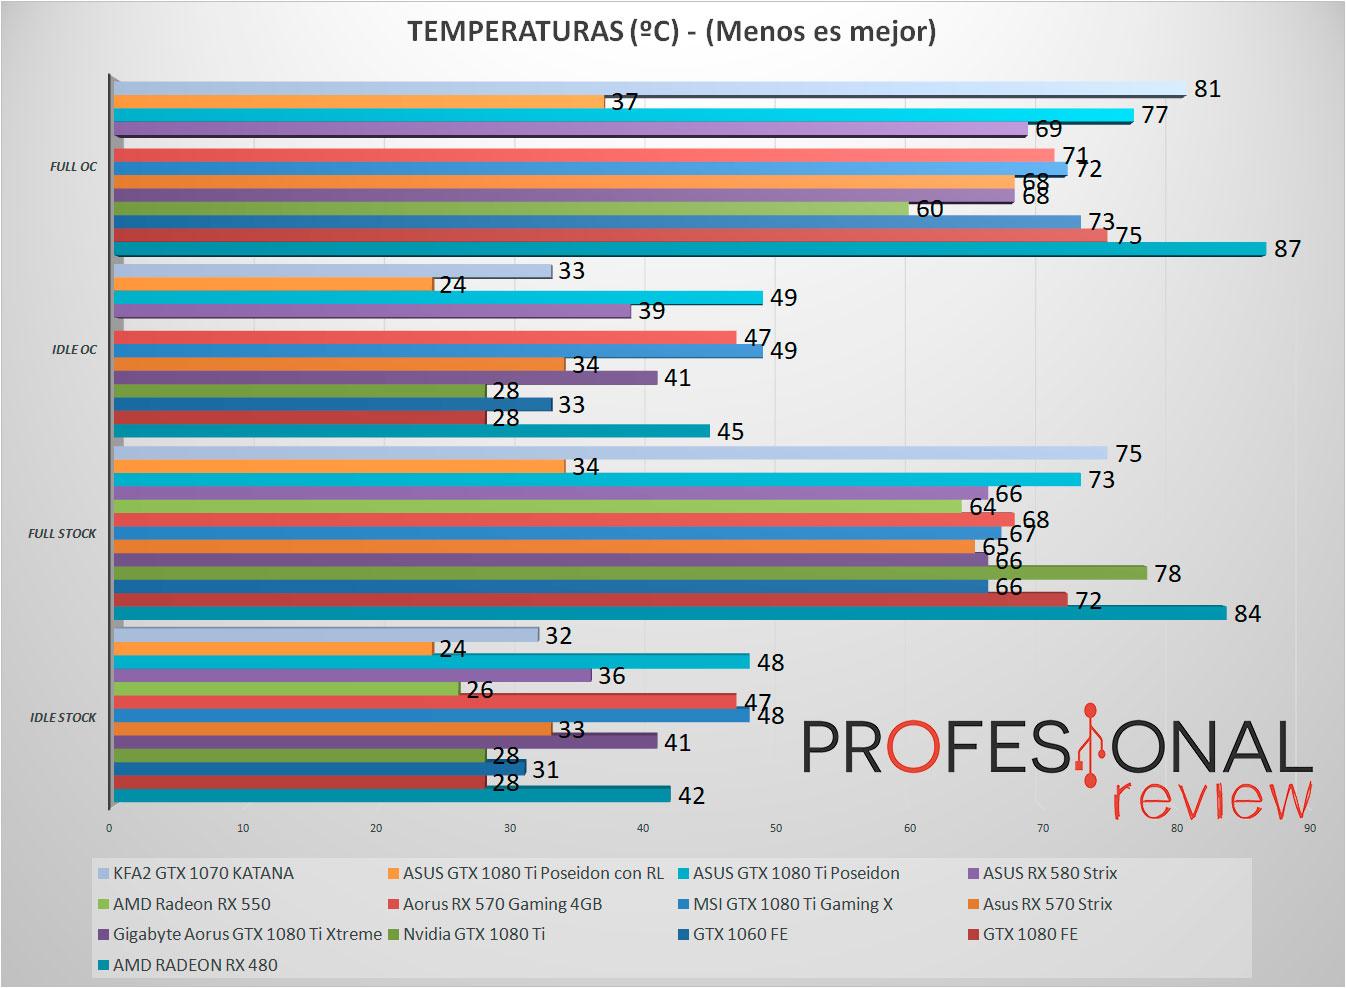 KFA2 GTX 1070 Katana temperaturas